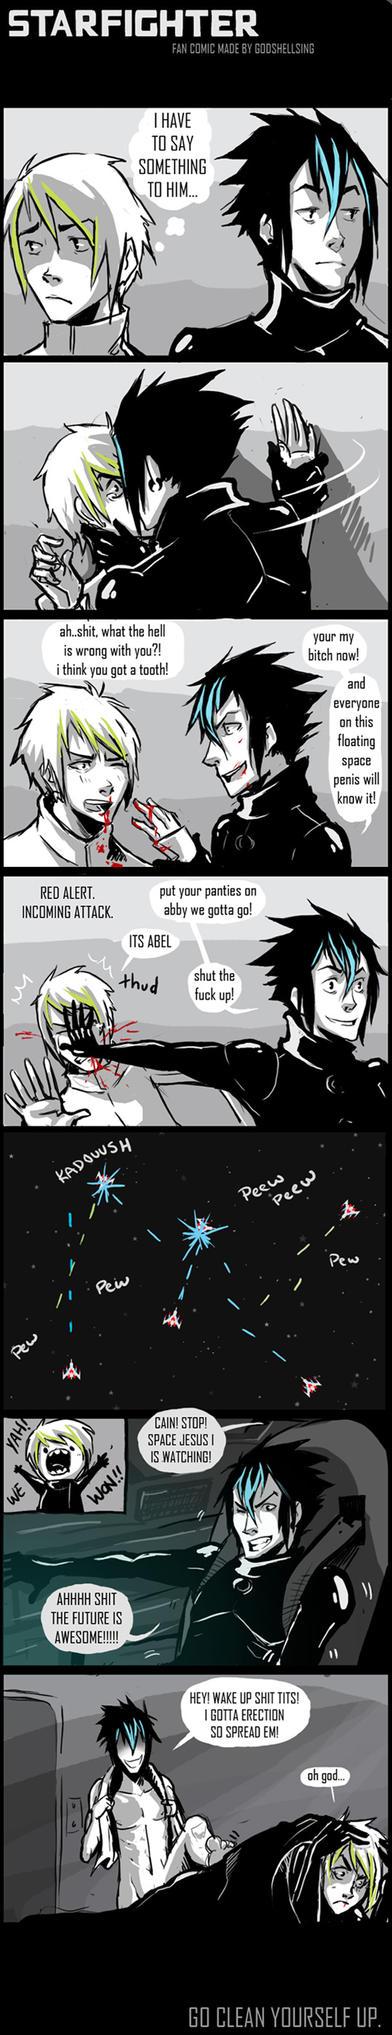 starfighter by GodsHellSing